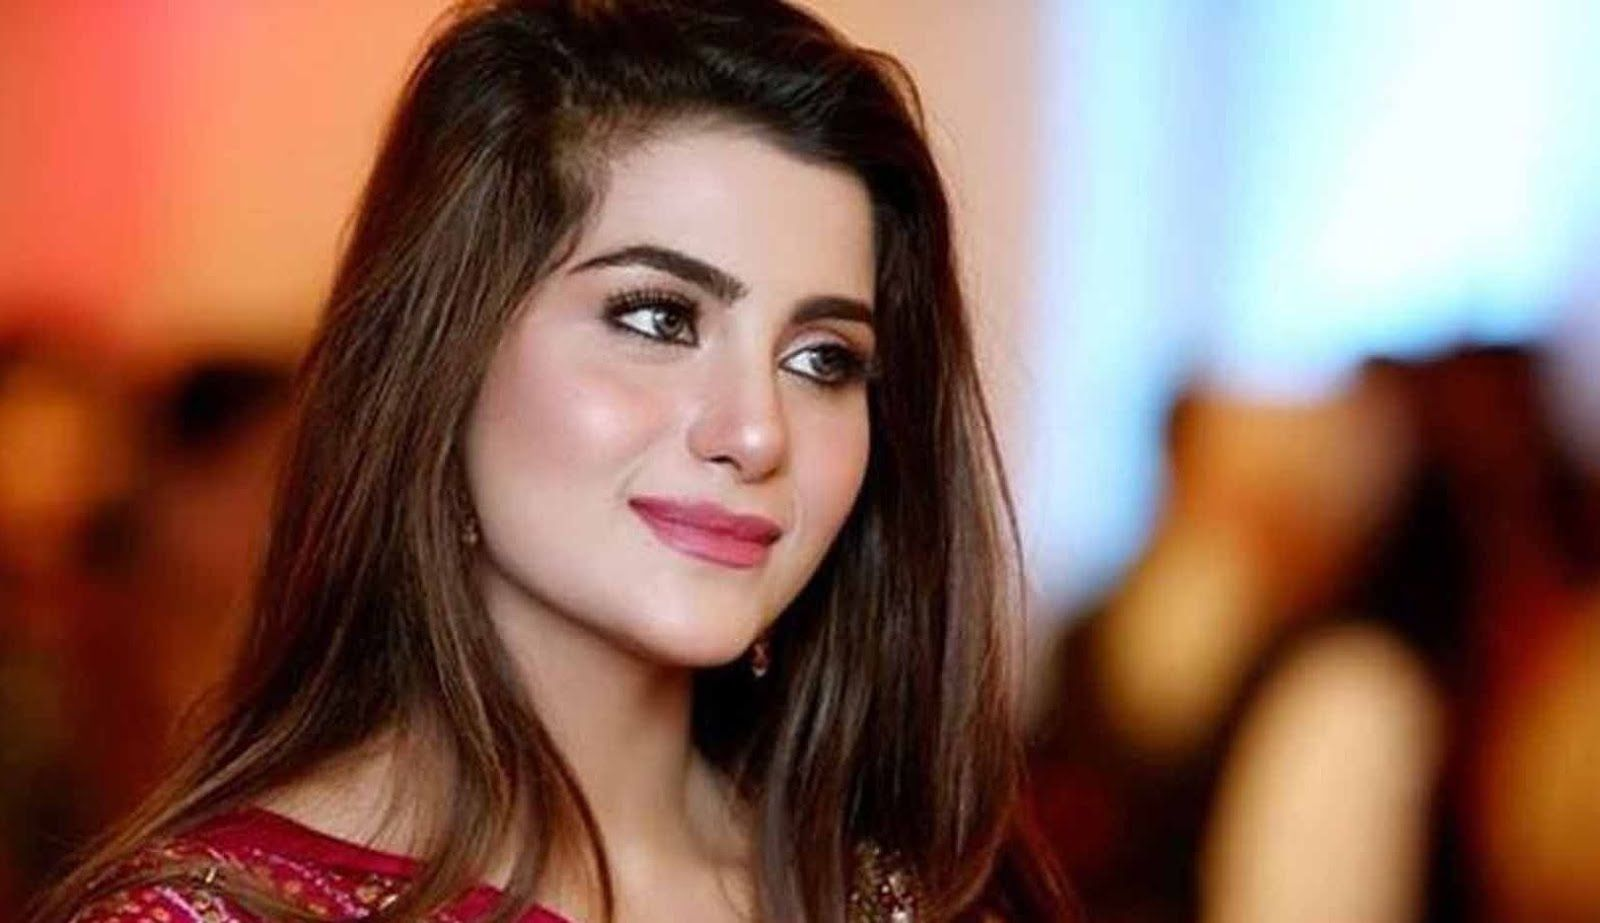 +18 Pakistans Babes: Laila hot pakistani girl latest